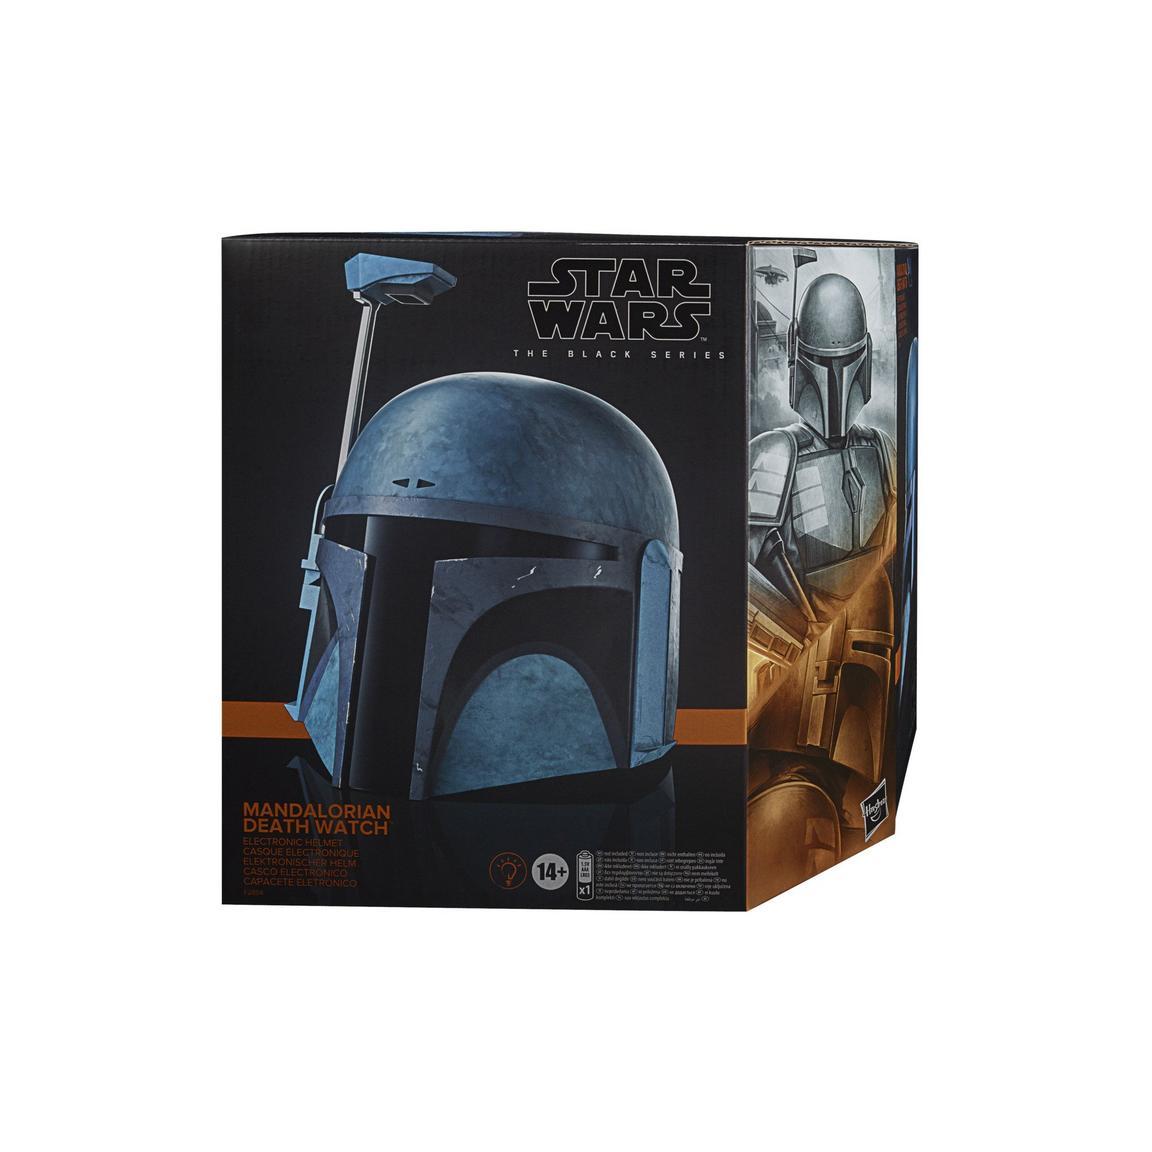 Star Wars The Black Series The Mandalorian Death Watch electronic Helmet画像